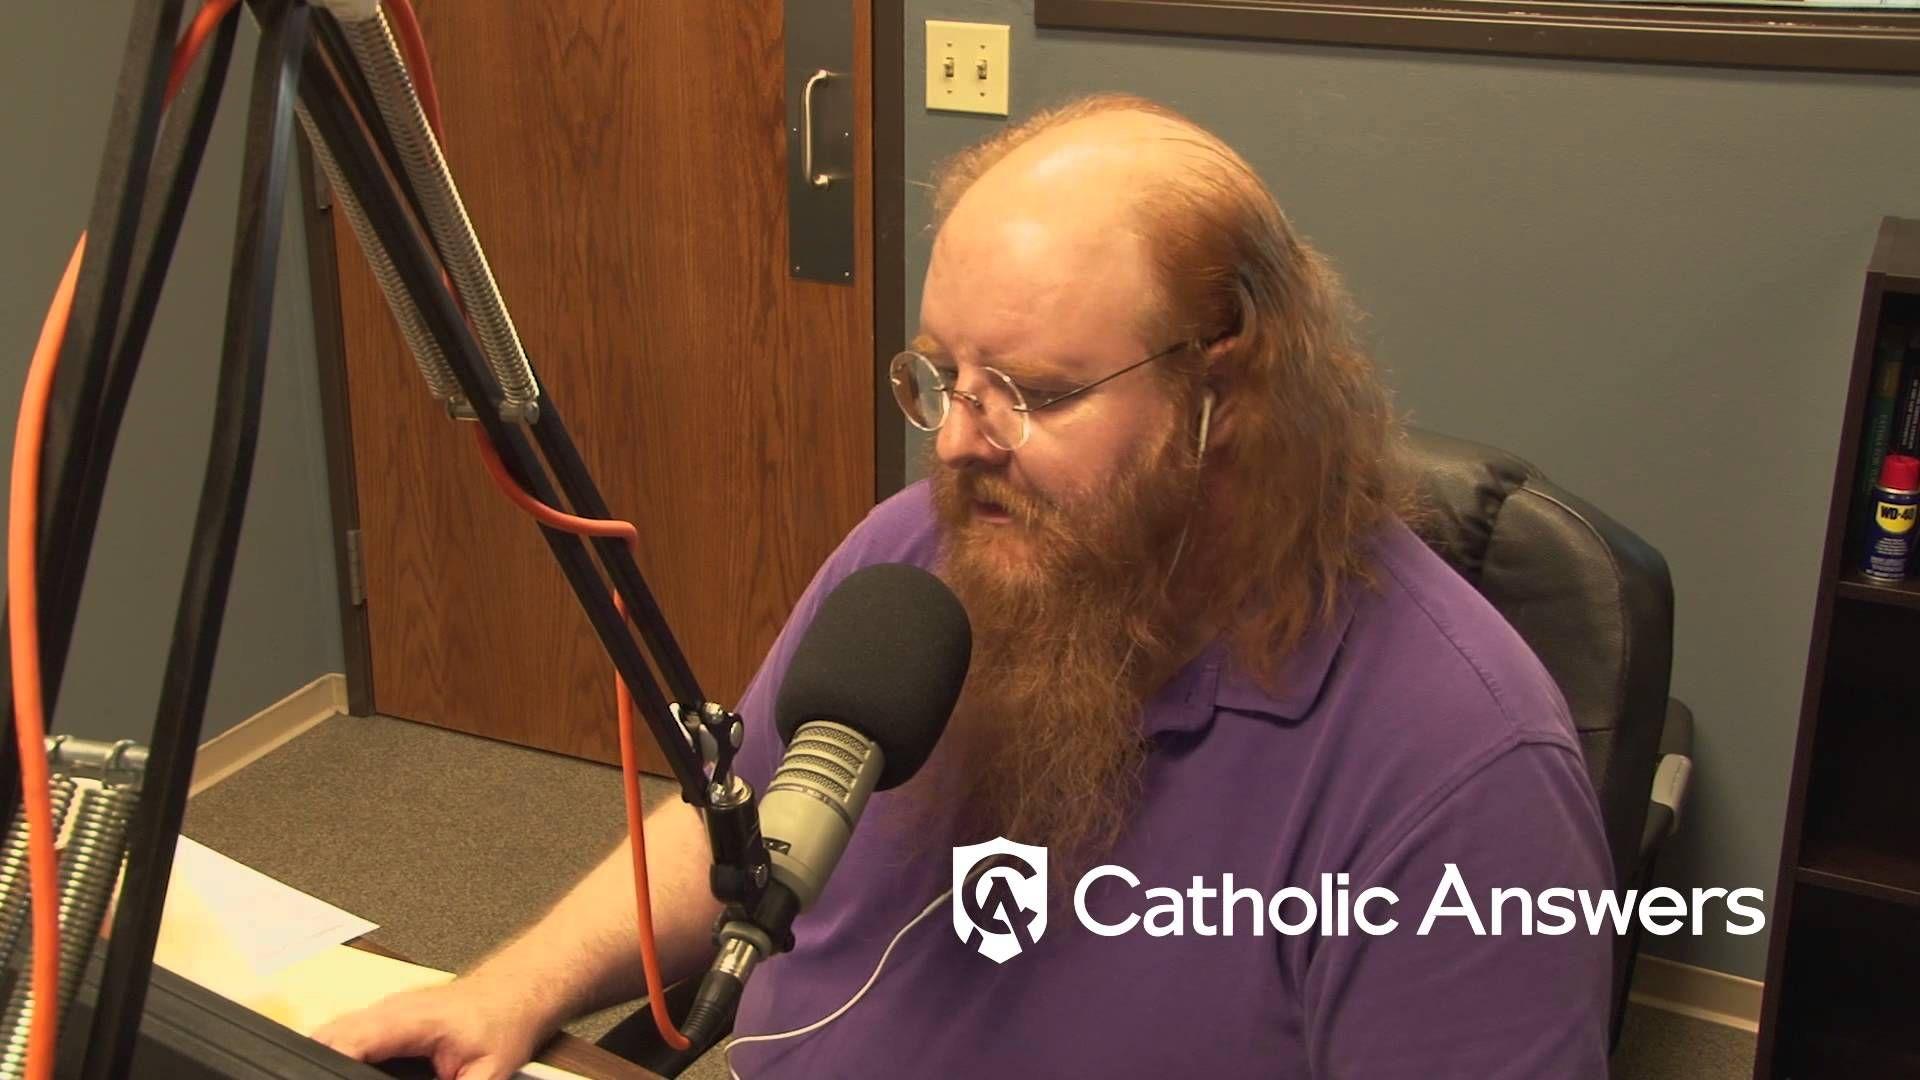 Jimmy Akin Do animals have souls? Catholic answers